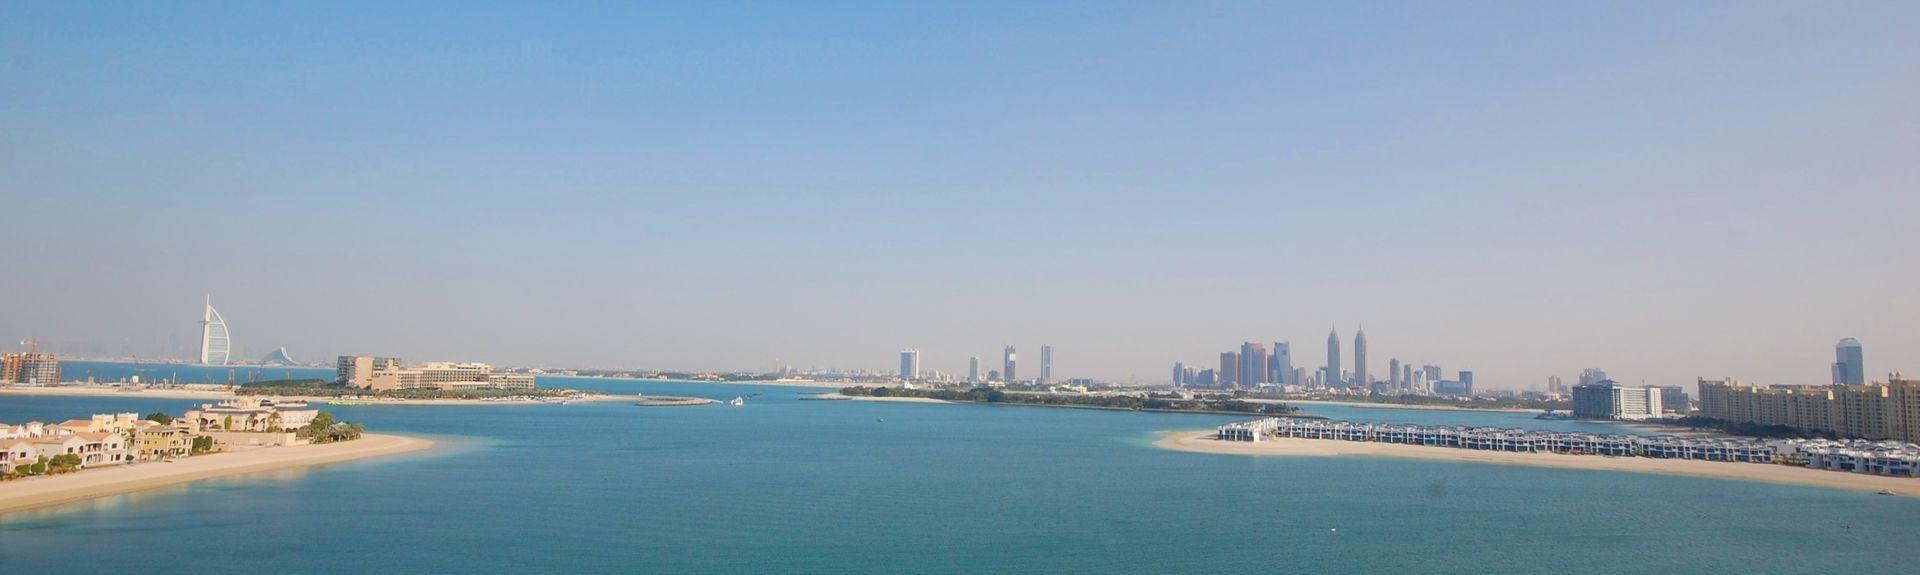 Ibn Battuta Mall, Dubai, Dubai, United Arab Emirates